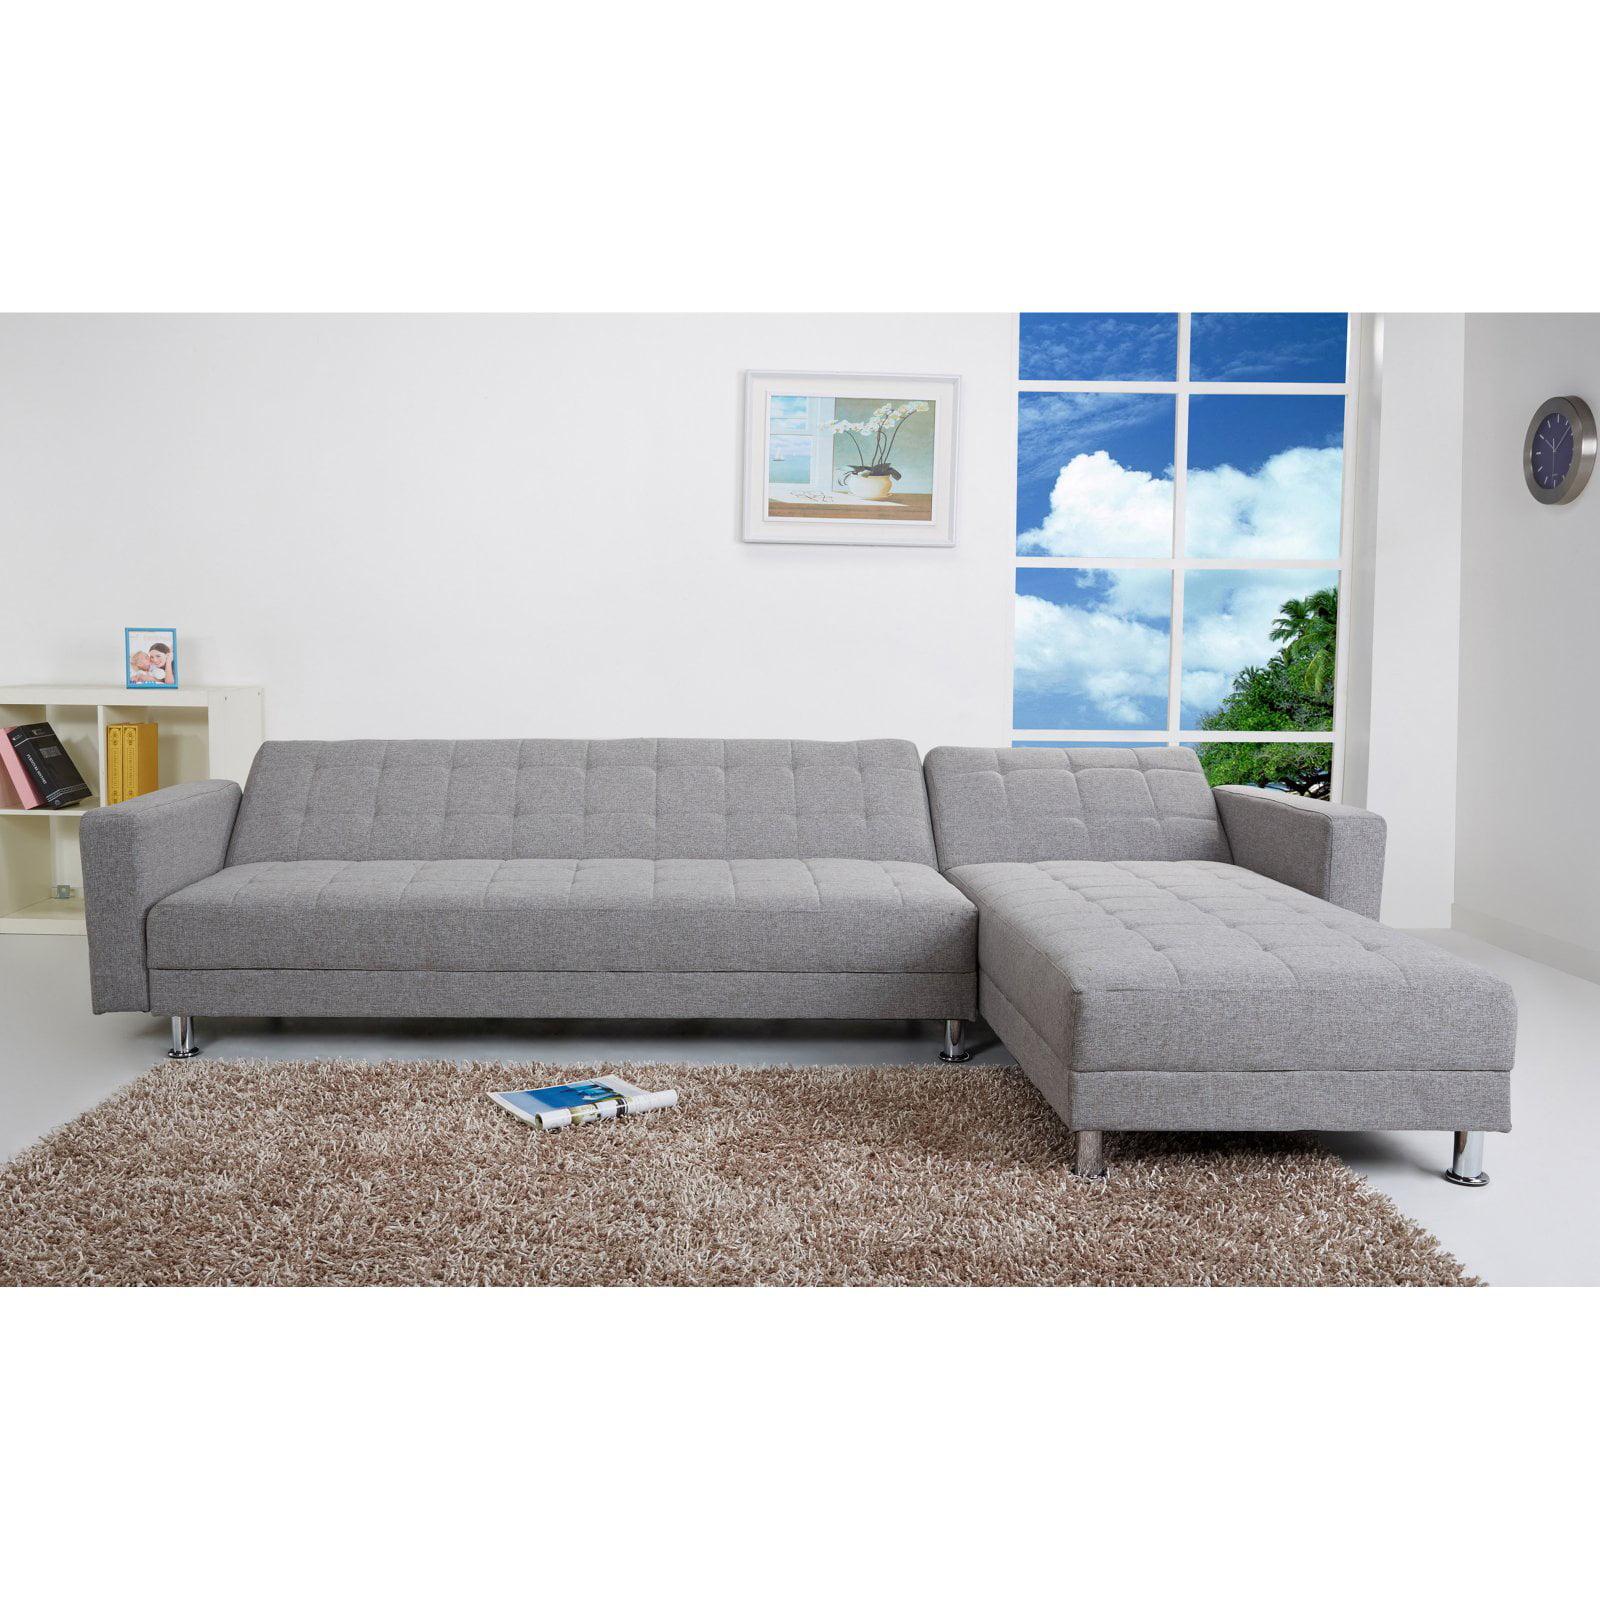 Gold Sparrow Frankfort Fabric Convertible Sectional Sofa Walmart